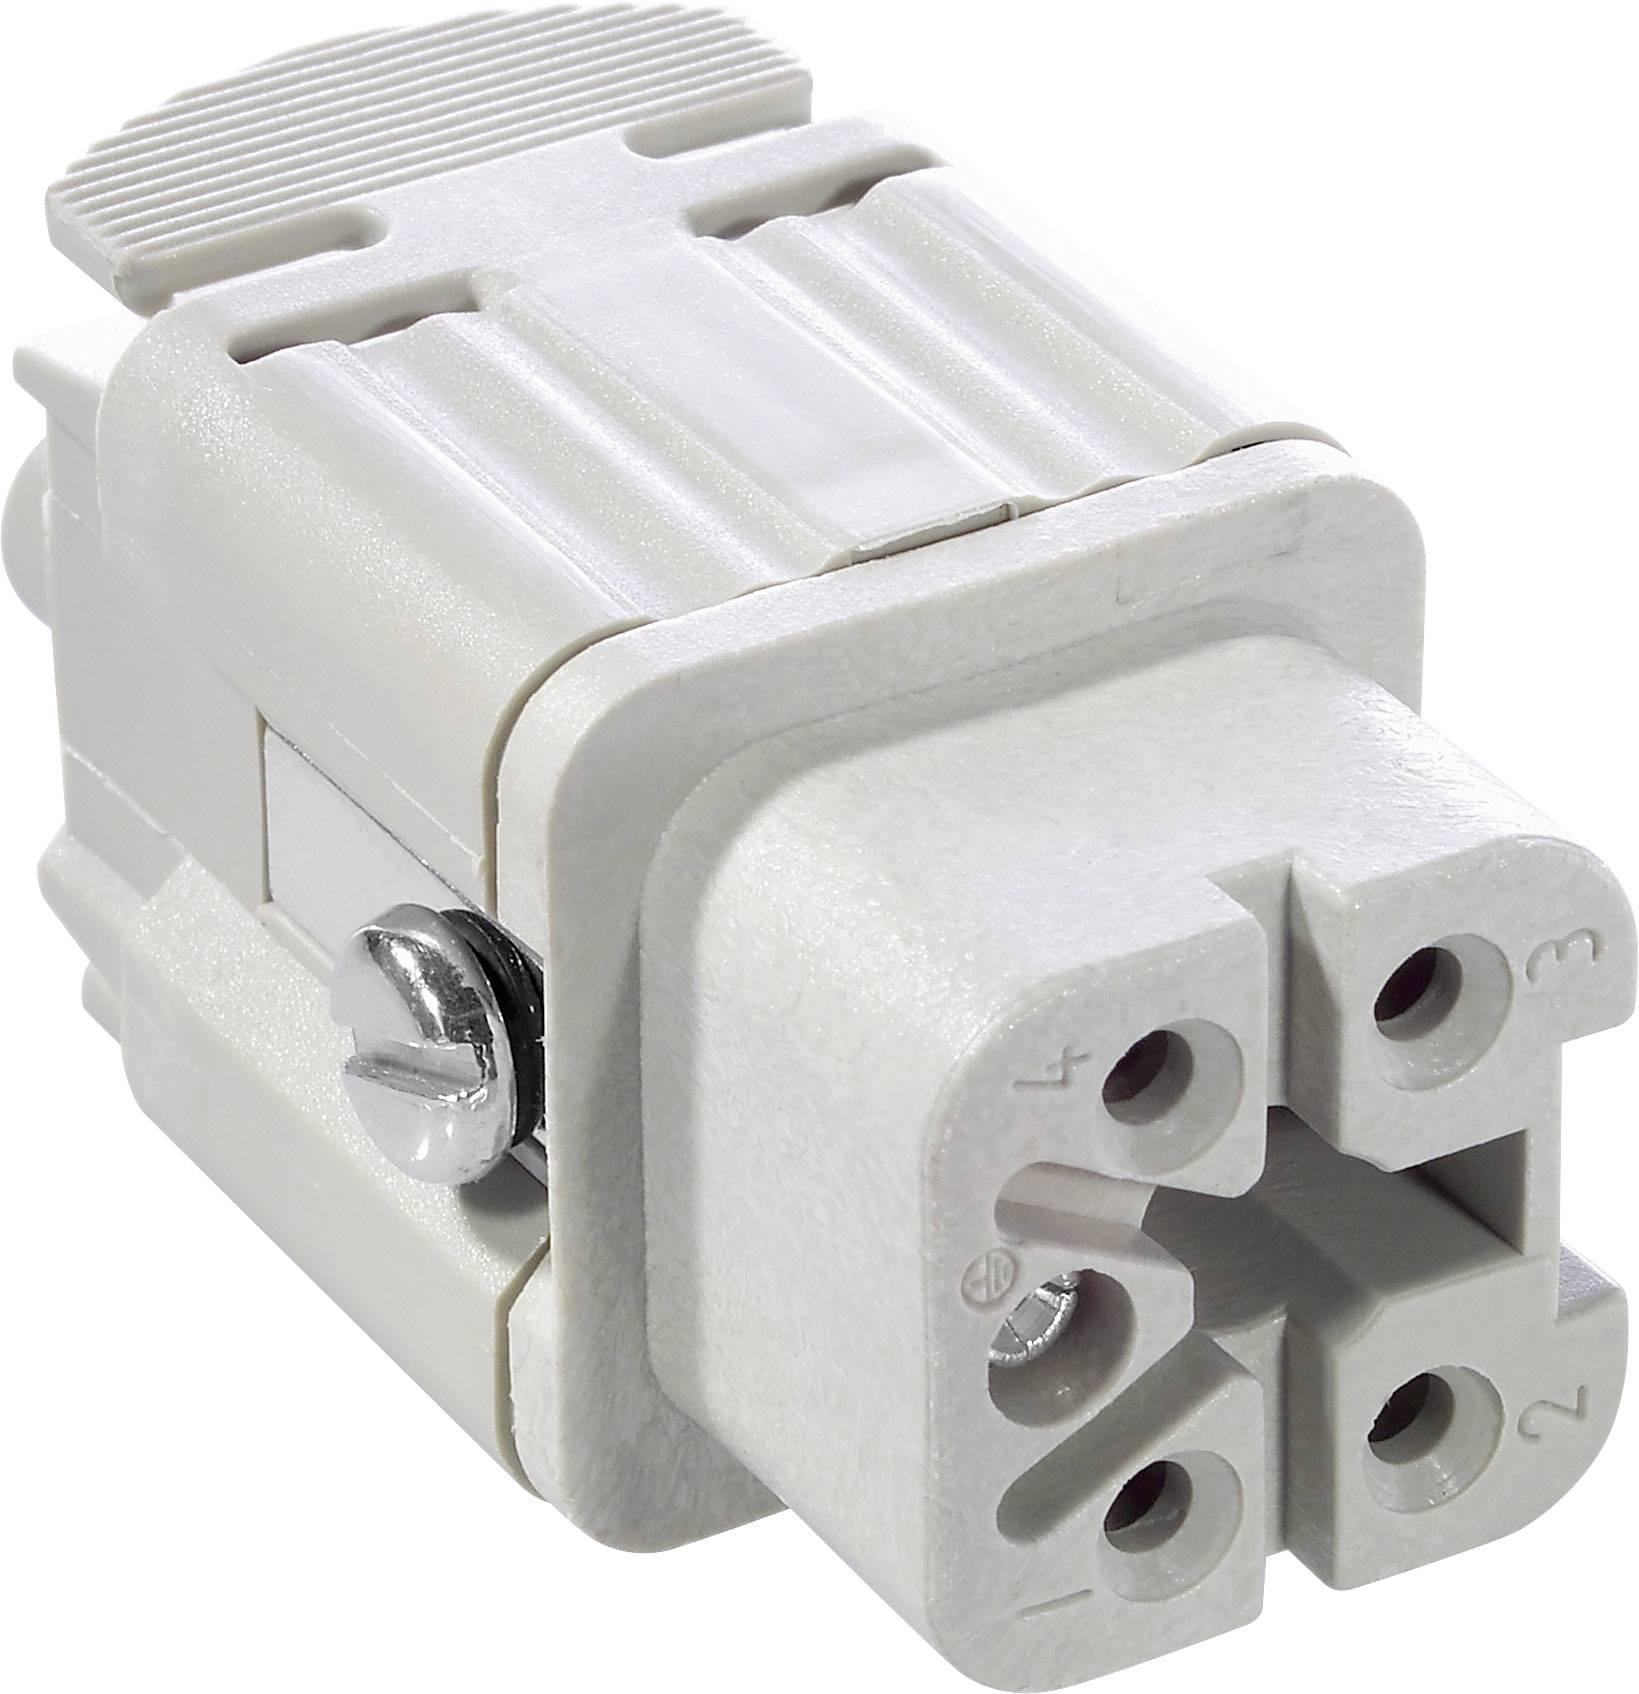 Sada konektorové zásuvky EPIC® H-A 4 10432000 LappKabel počet kontaktů 4 + PE 1 ks